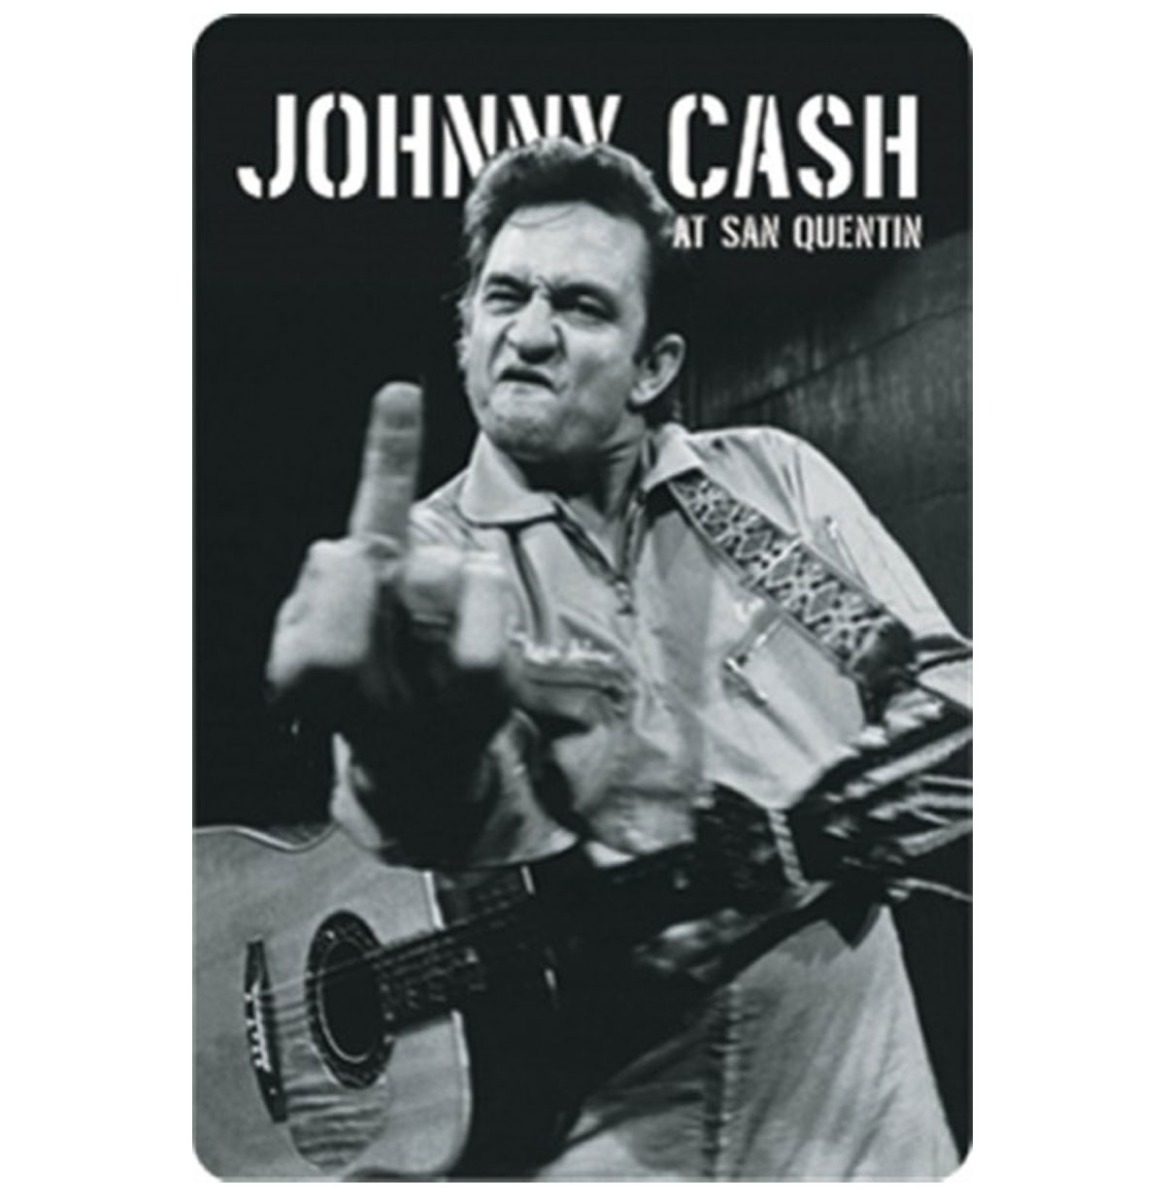 Johnny Cash Metalen Bord 30 x 20 cm